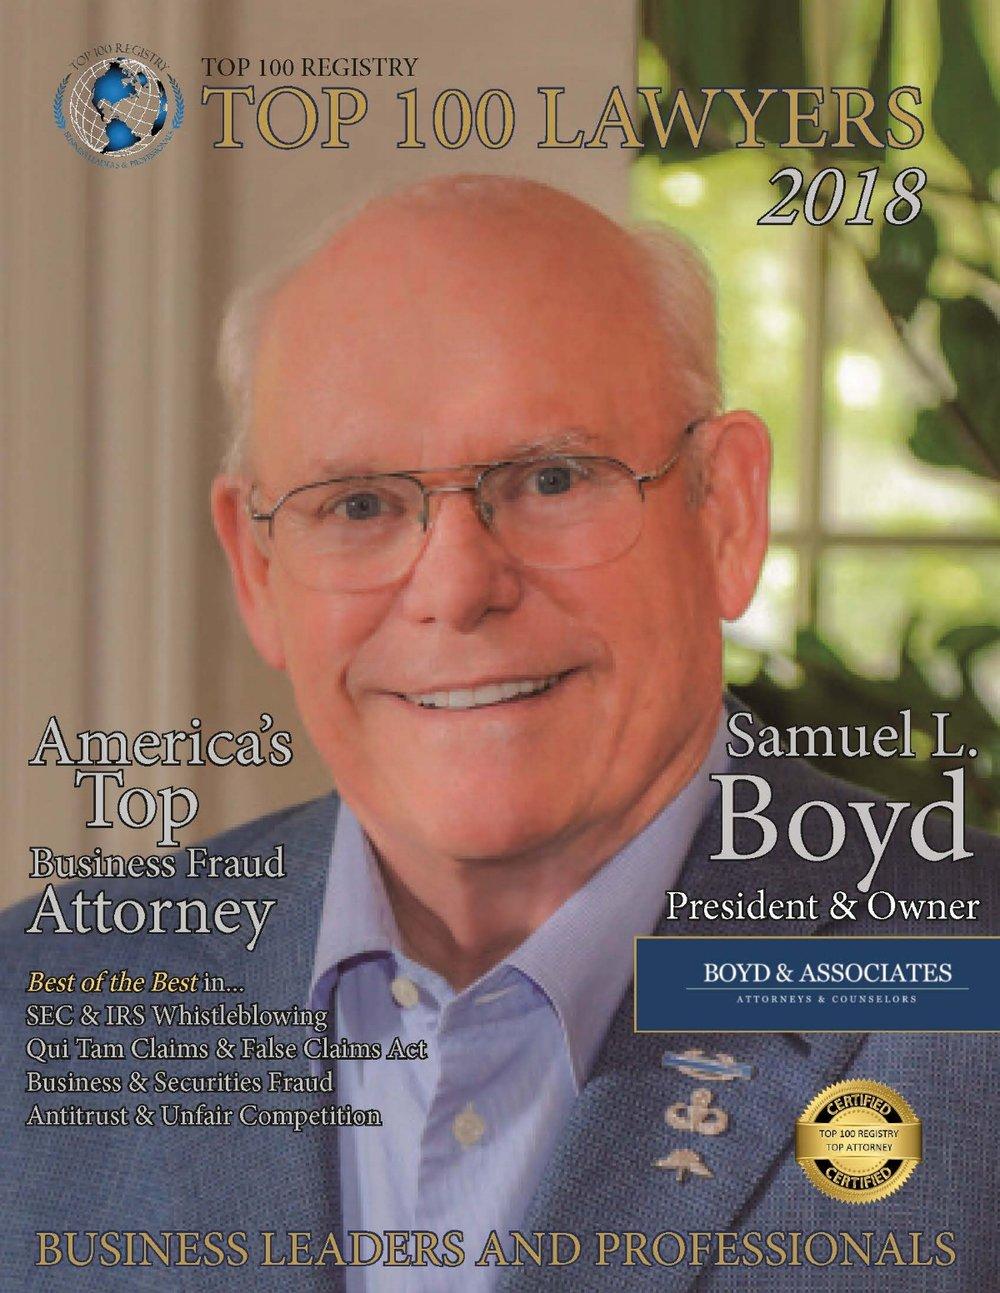 2018 Top 100 Lawyers Magazine